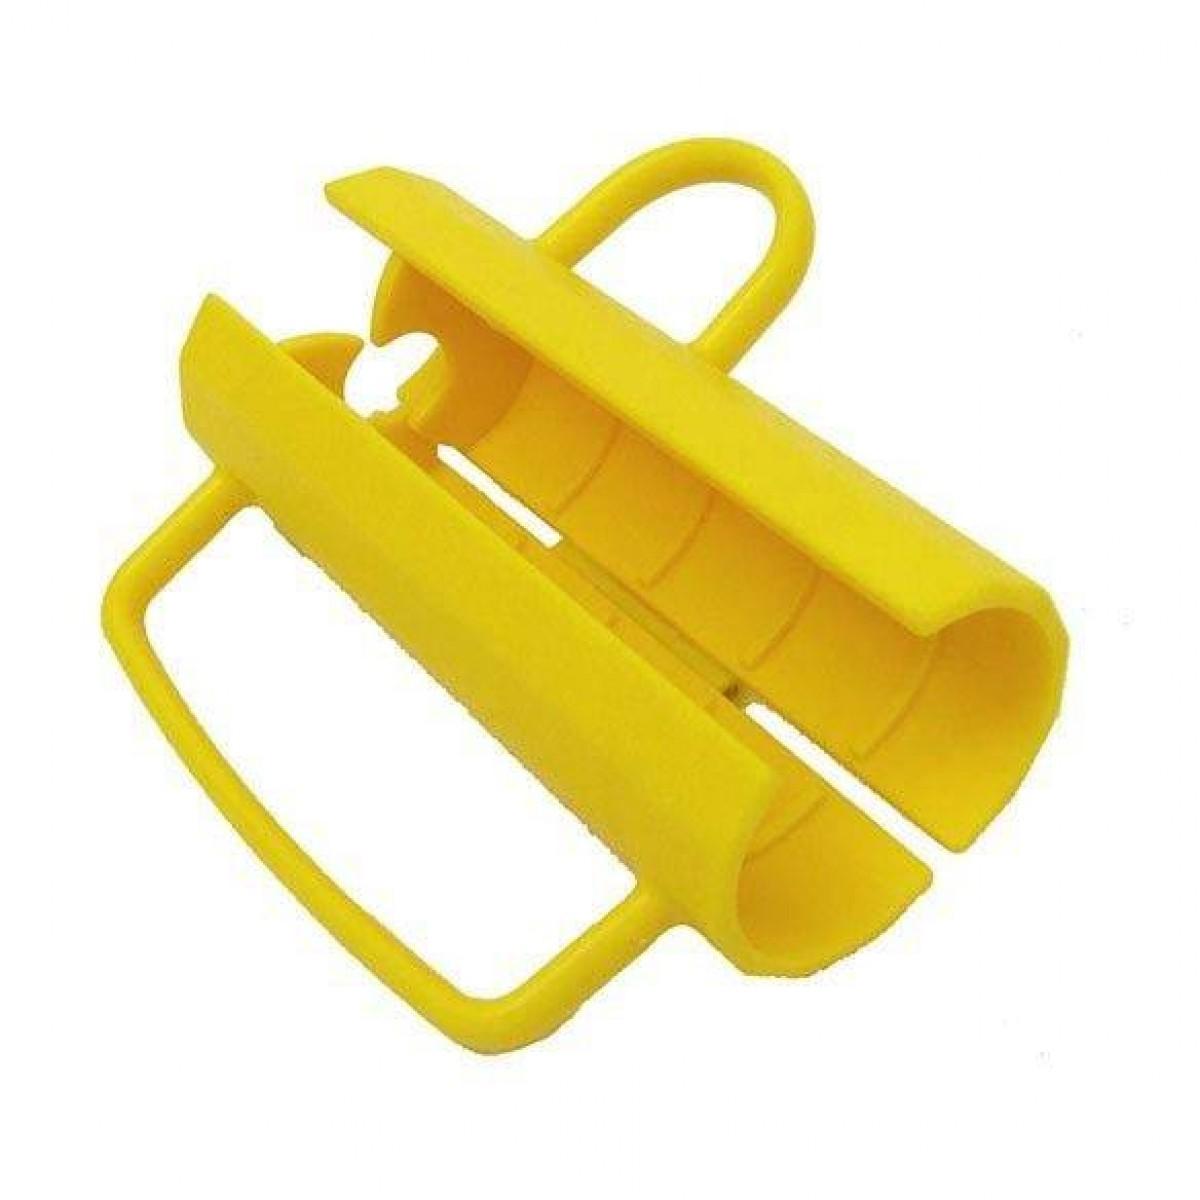 4478 Stem Stripper Yellow